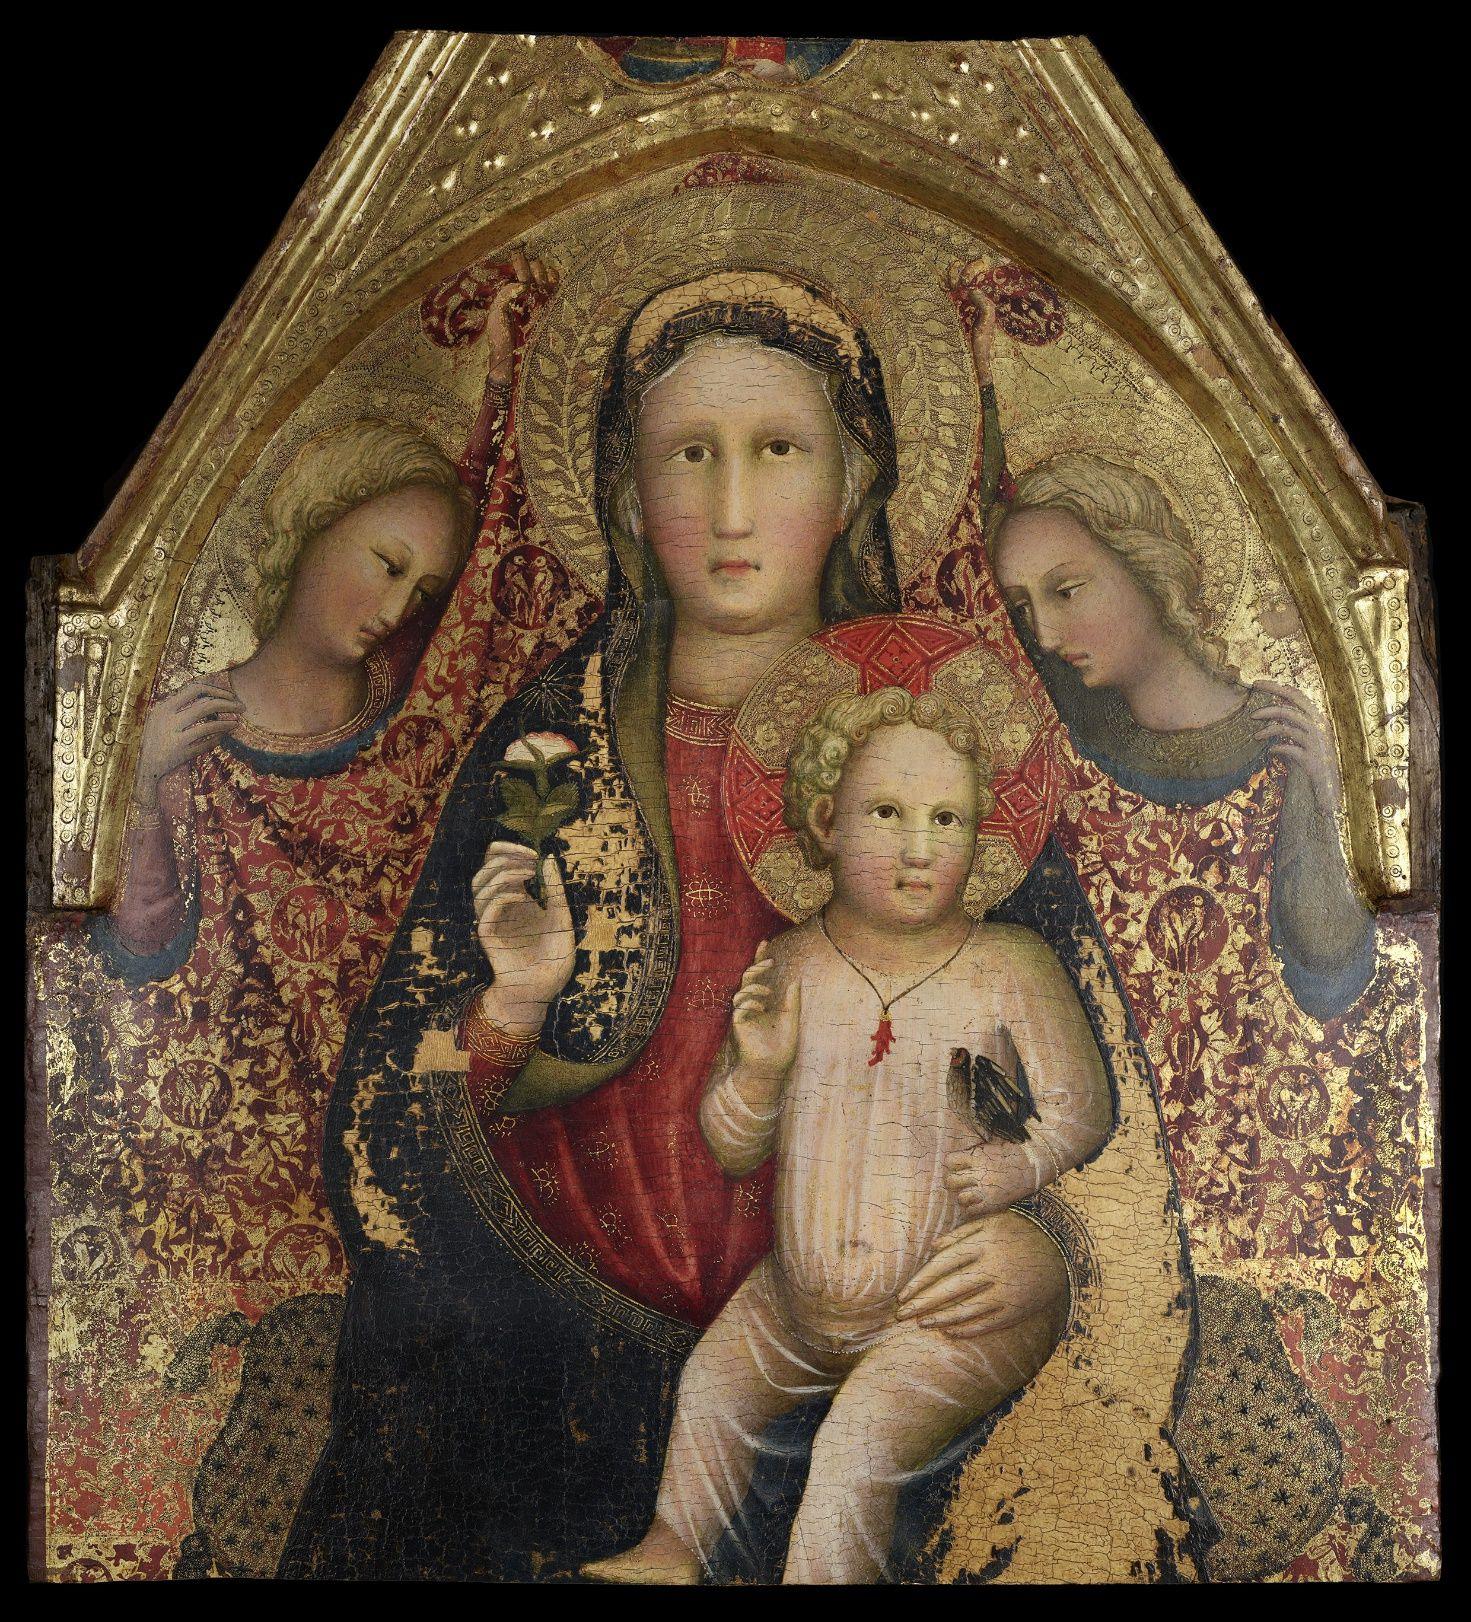 madonna in trono con bambino e angeli